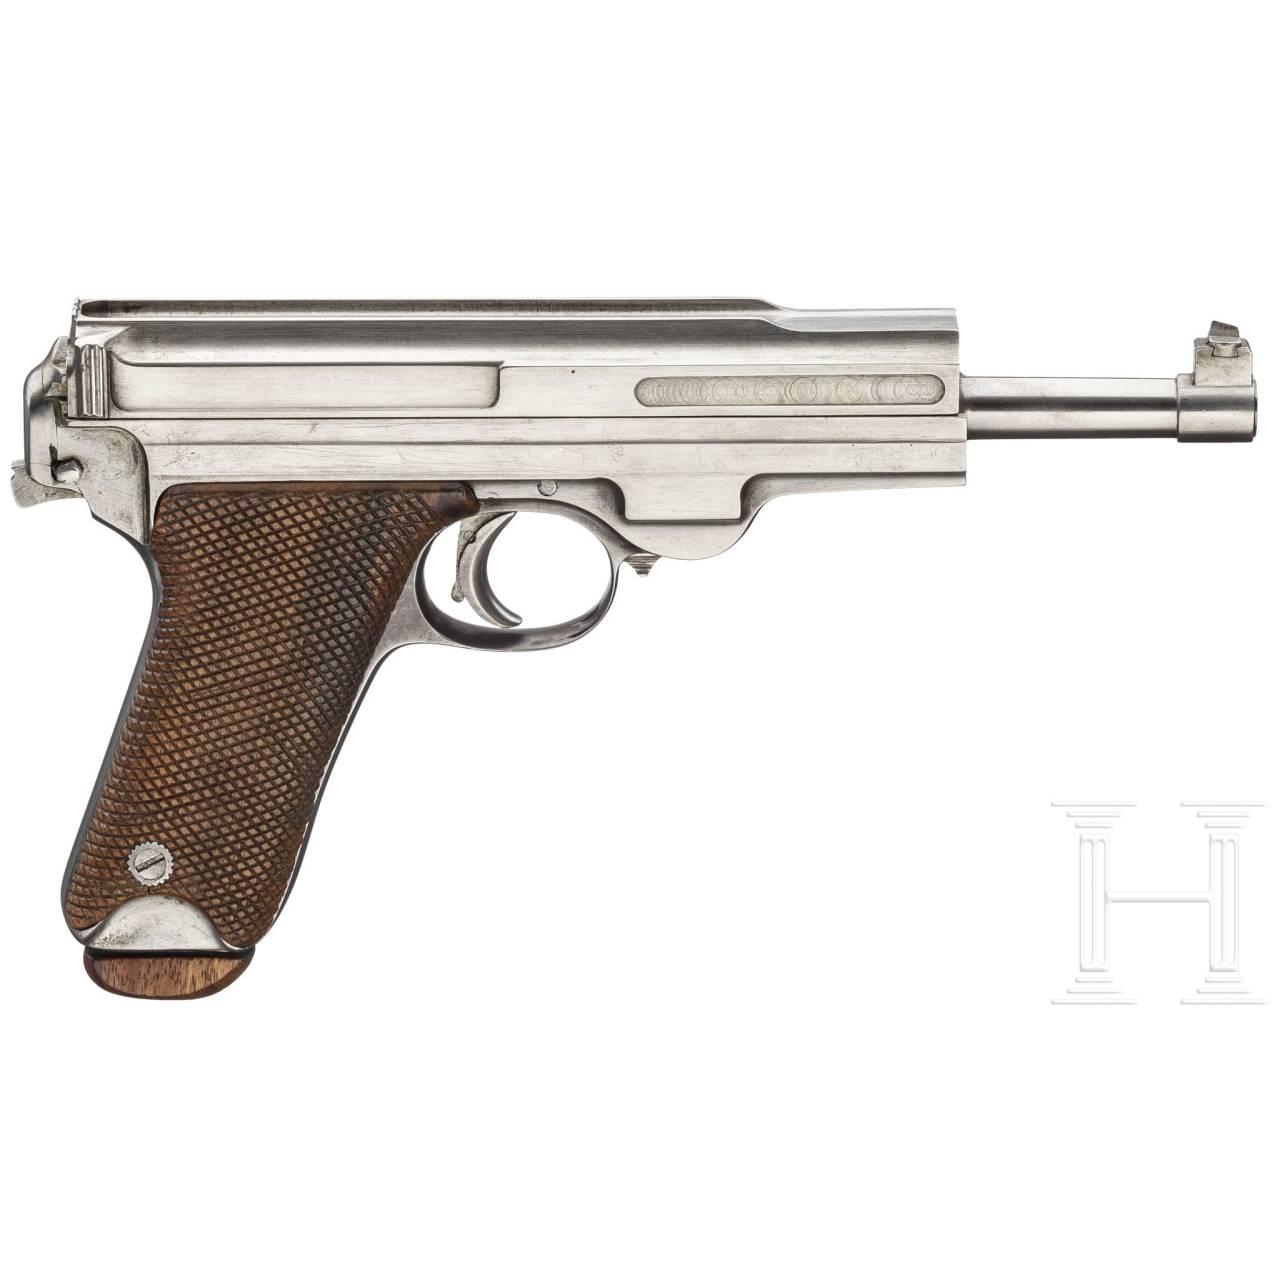 Pistole System Müller, Winterthur, Prototyp/Versuch, 1902